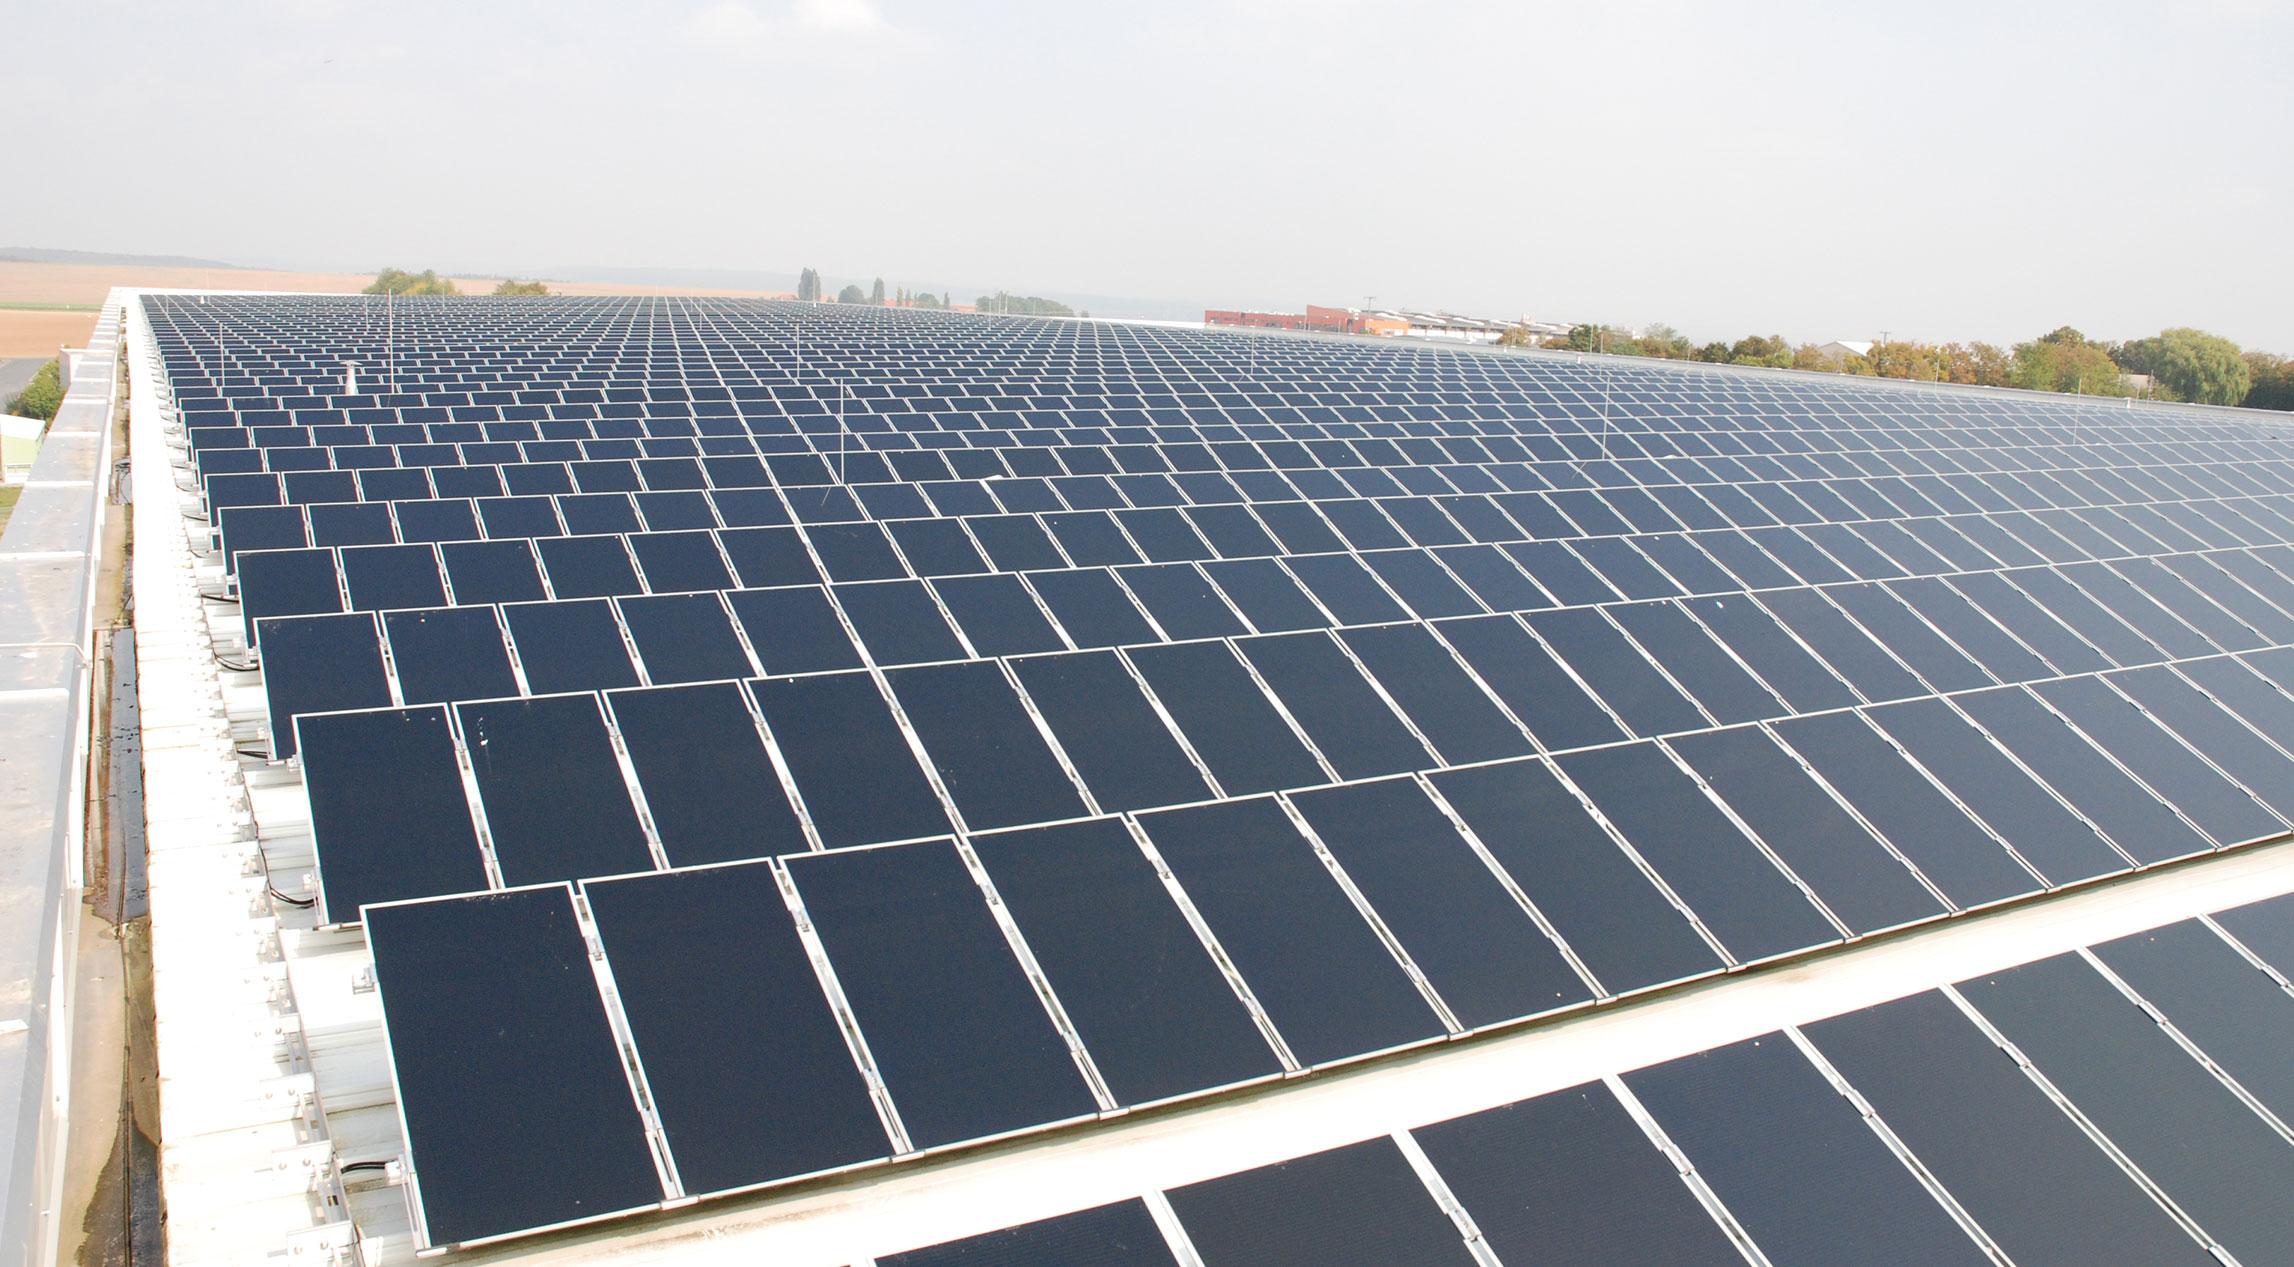 Viele Solarpanele